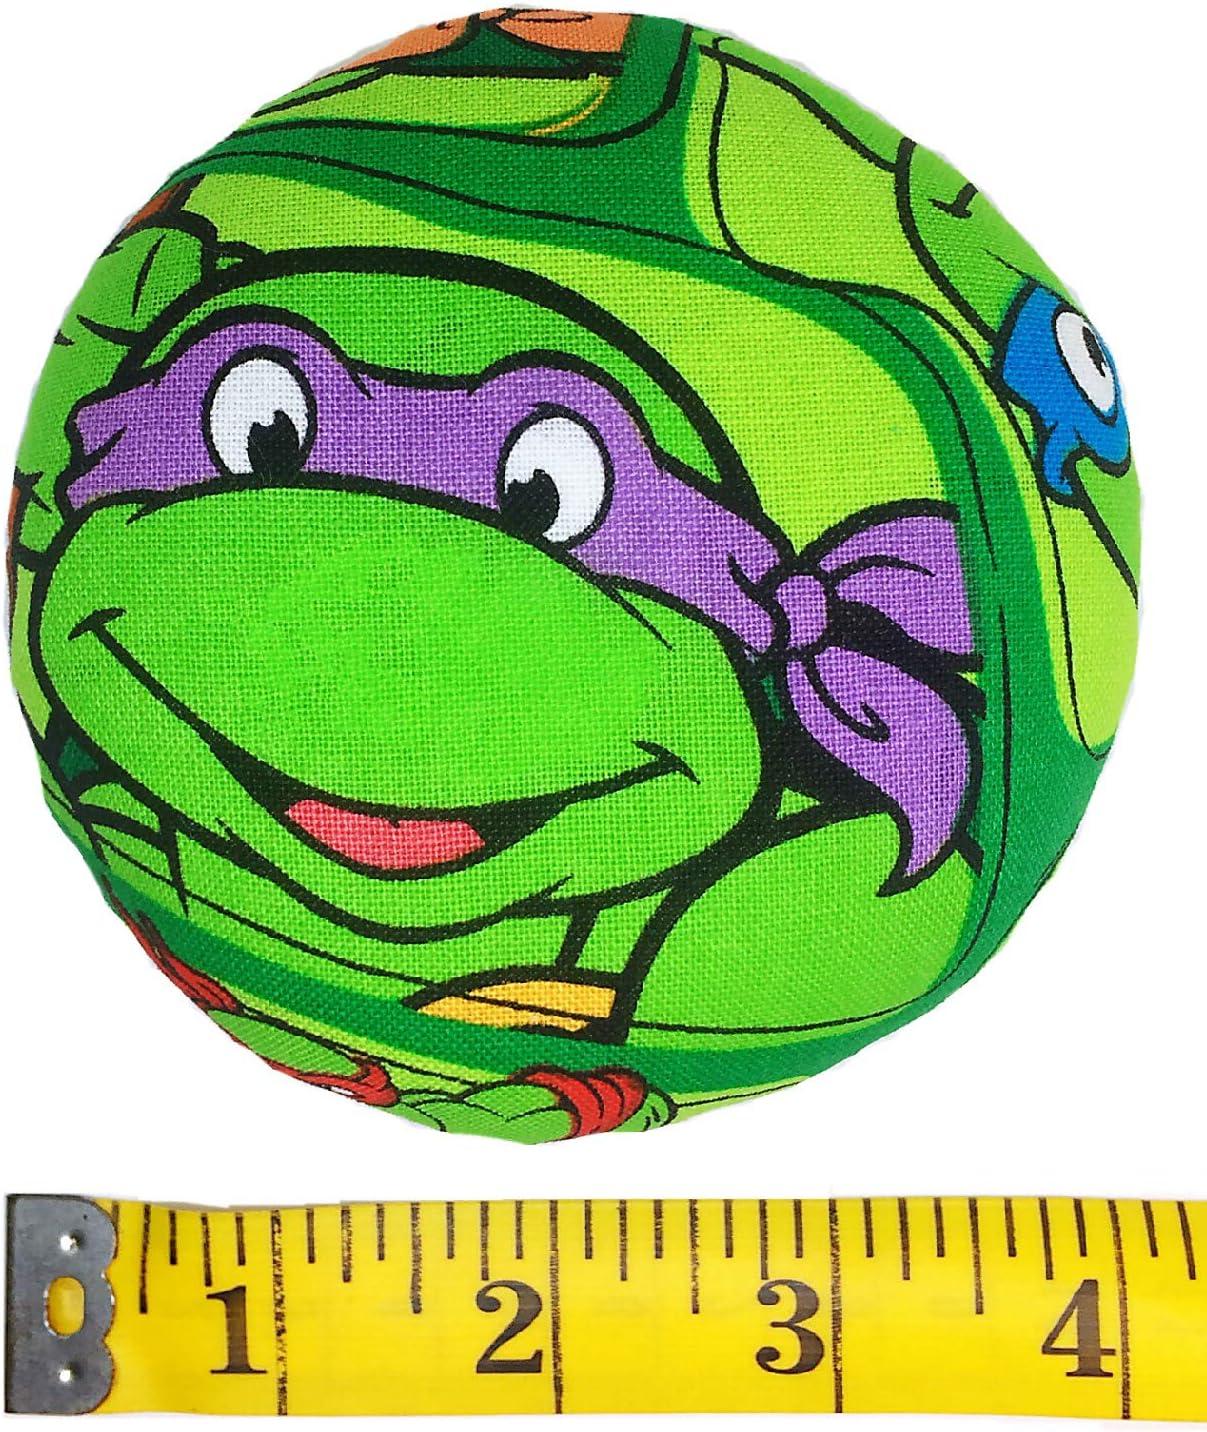 Pin Cushion Emery10 oz Needle Storage Organizer Fabric Pattern Cloth//Fabric Weight Frog